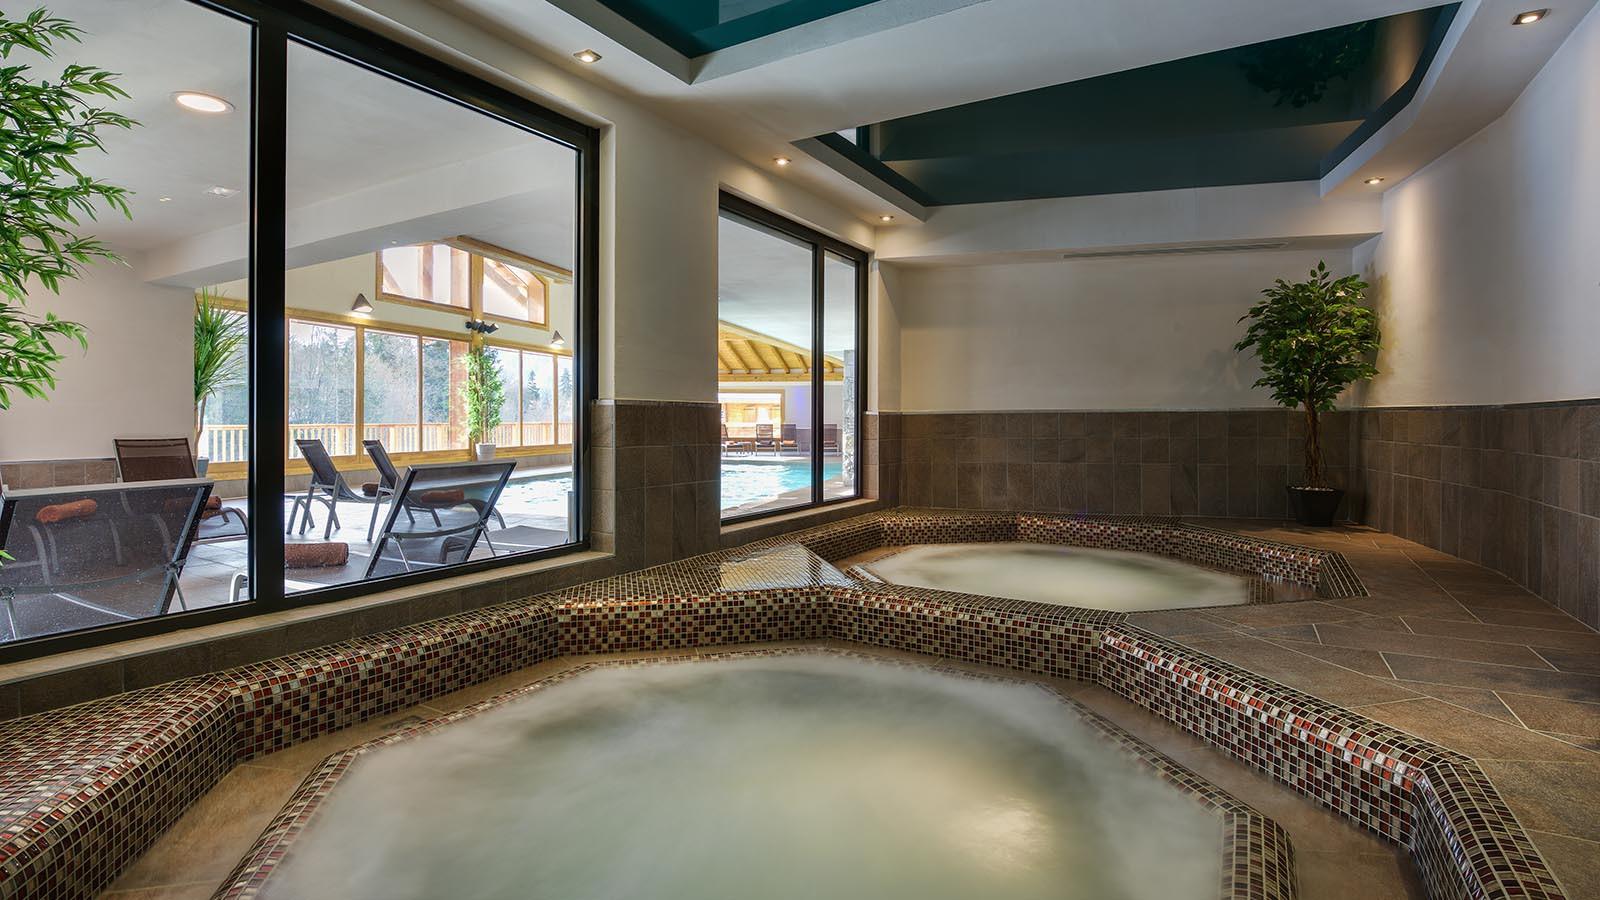 Whirlpool at CGH Apartment Leana